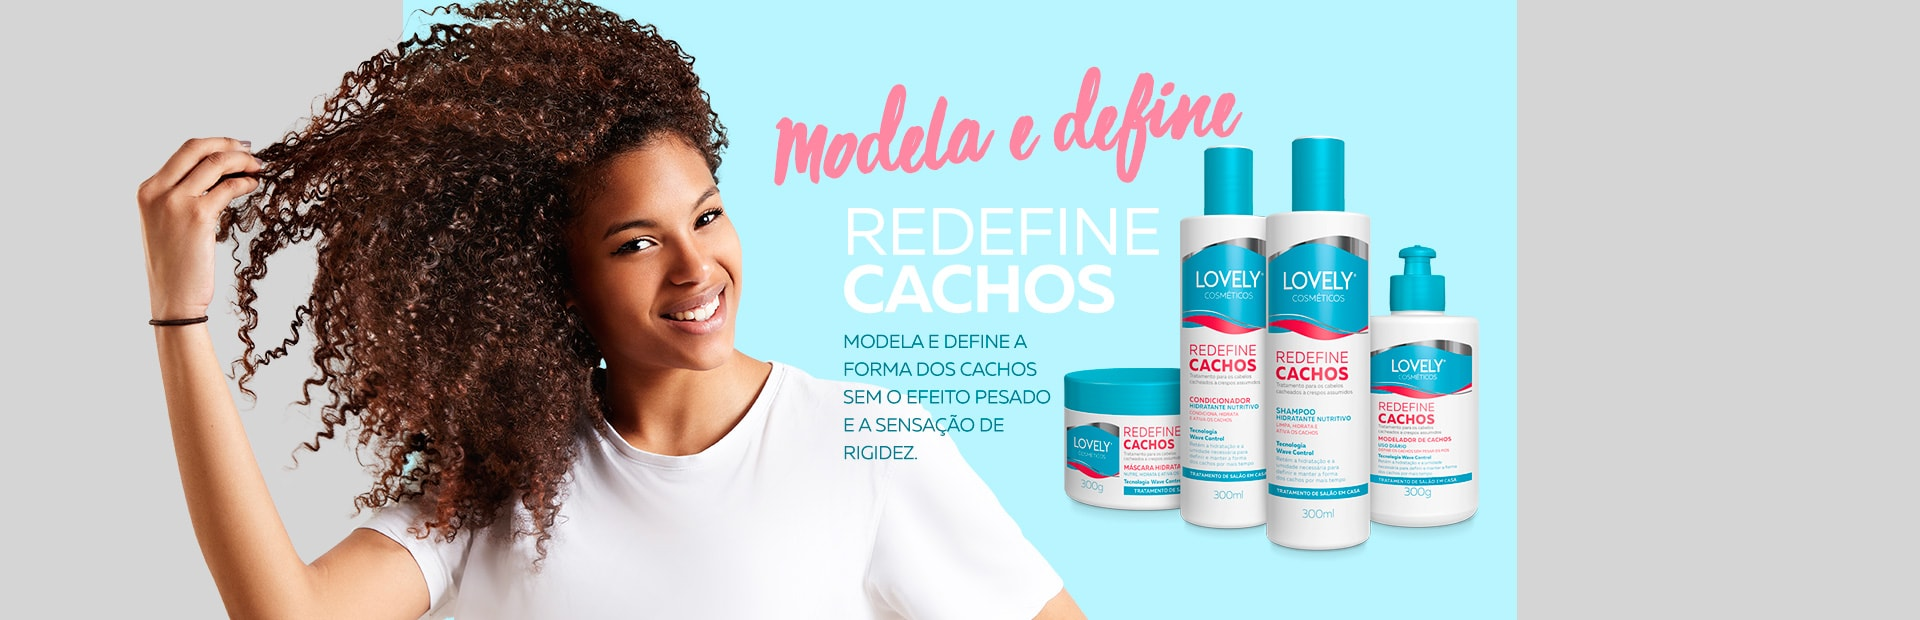 Lovelycosmeticos-redefine-cachos